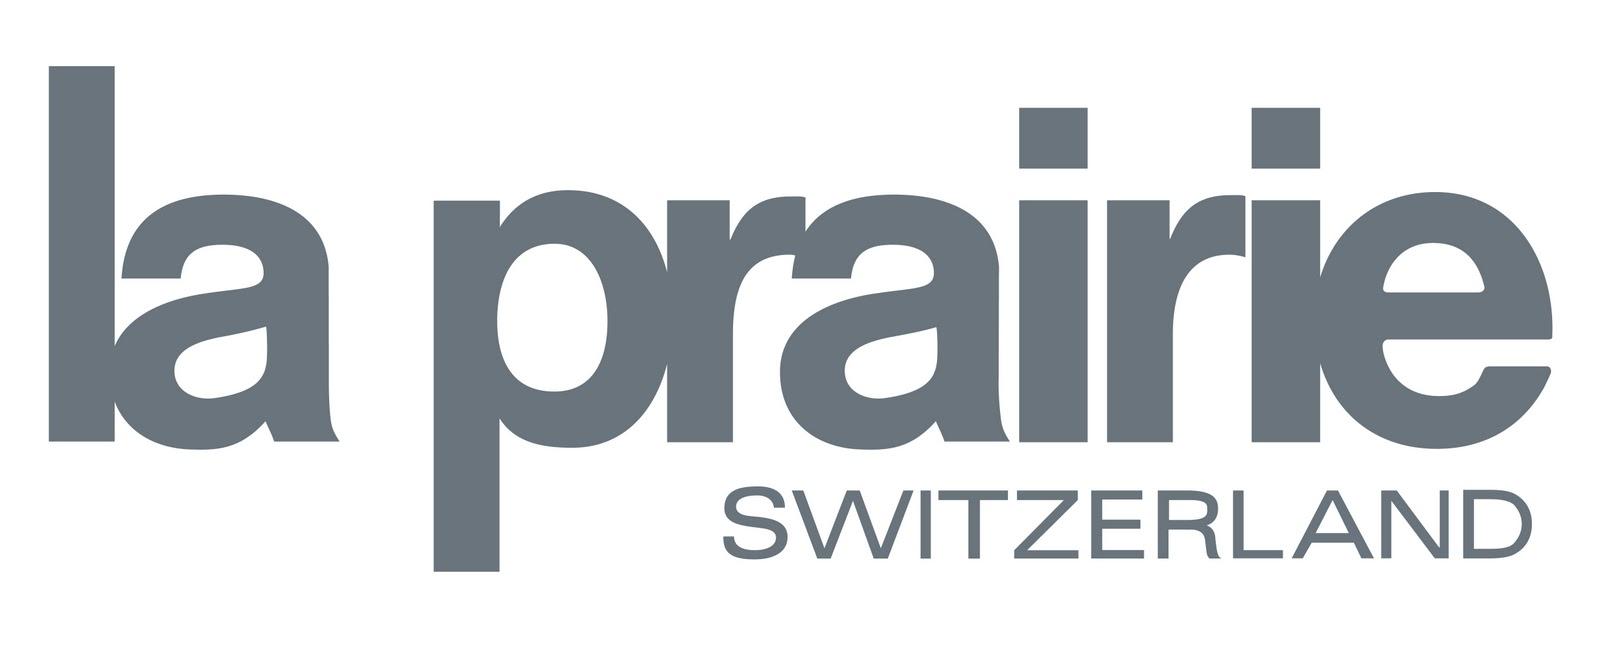 http://4.bp.blogspot.com/-hh-oFIqzG0E/Tz0BH8d32yI/AAAAAAAAEVM/JLbxf573b3w/s1600/la+prairie+logo.jpg